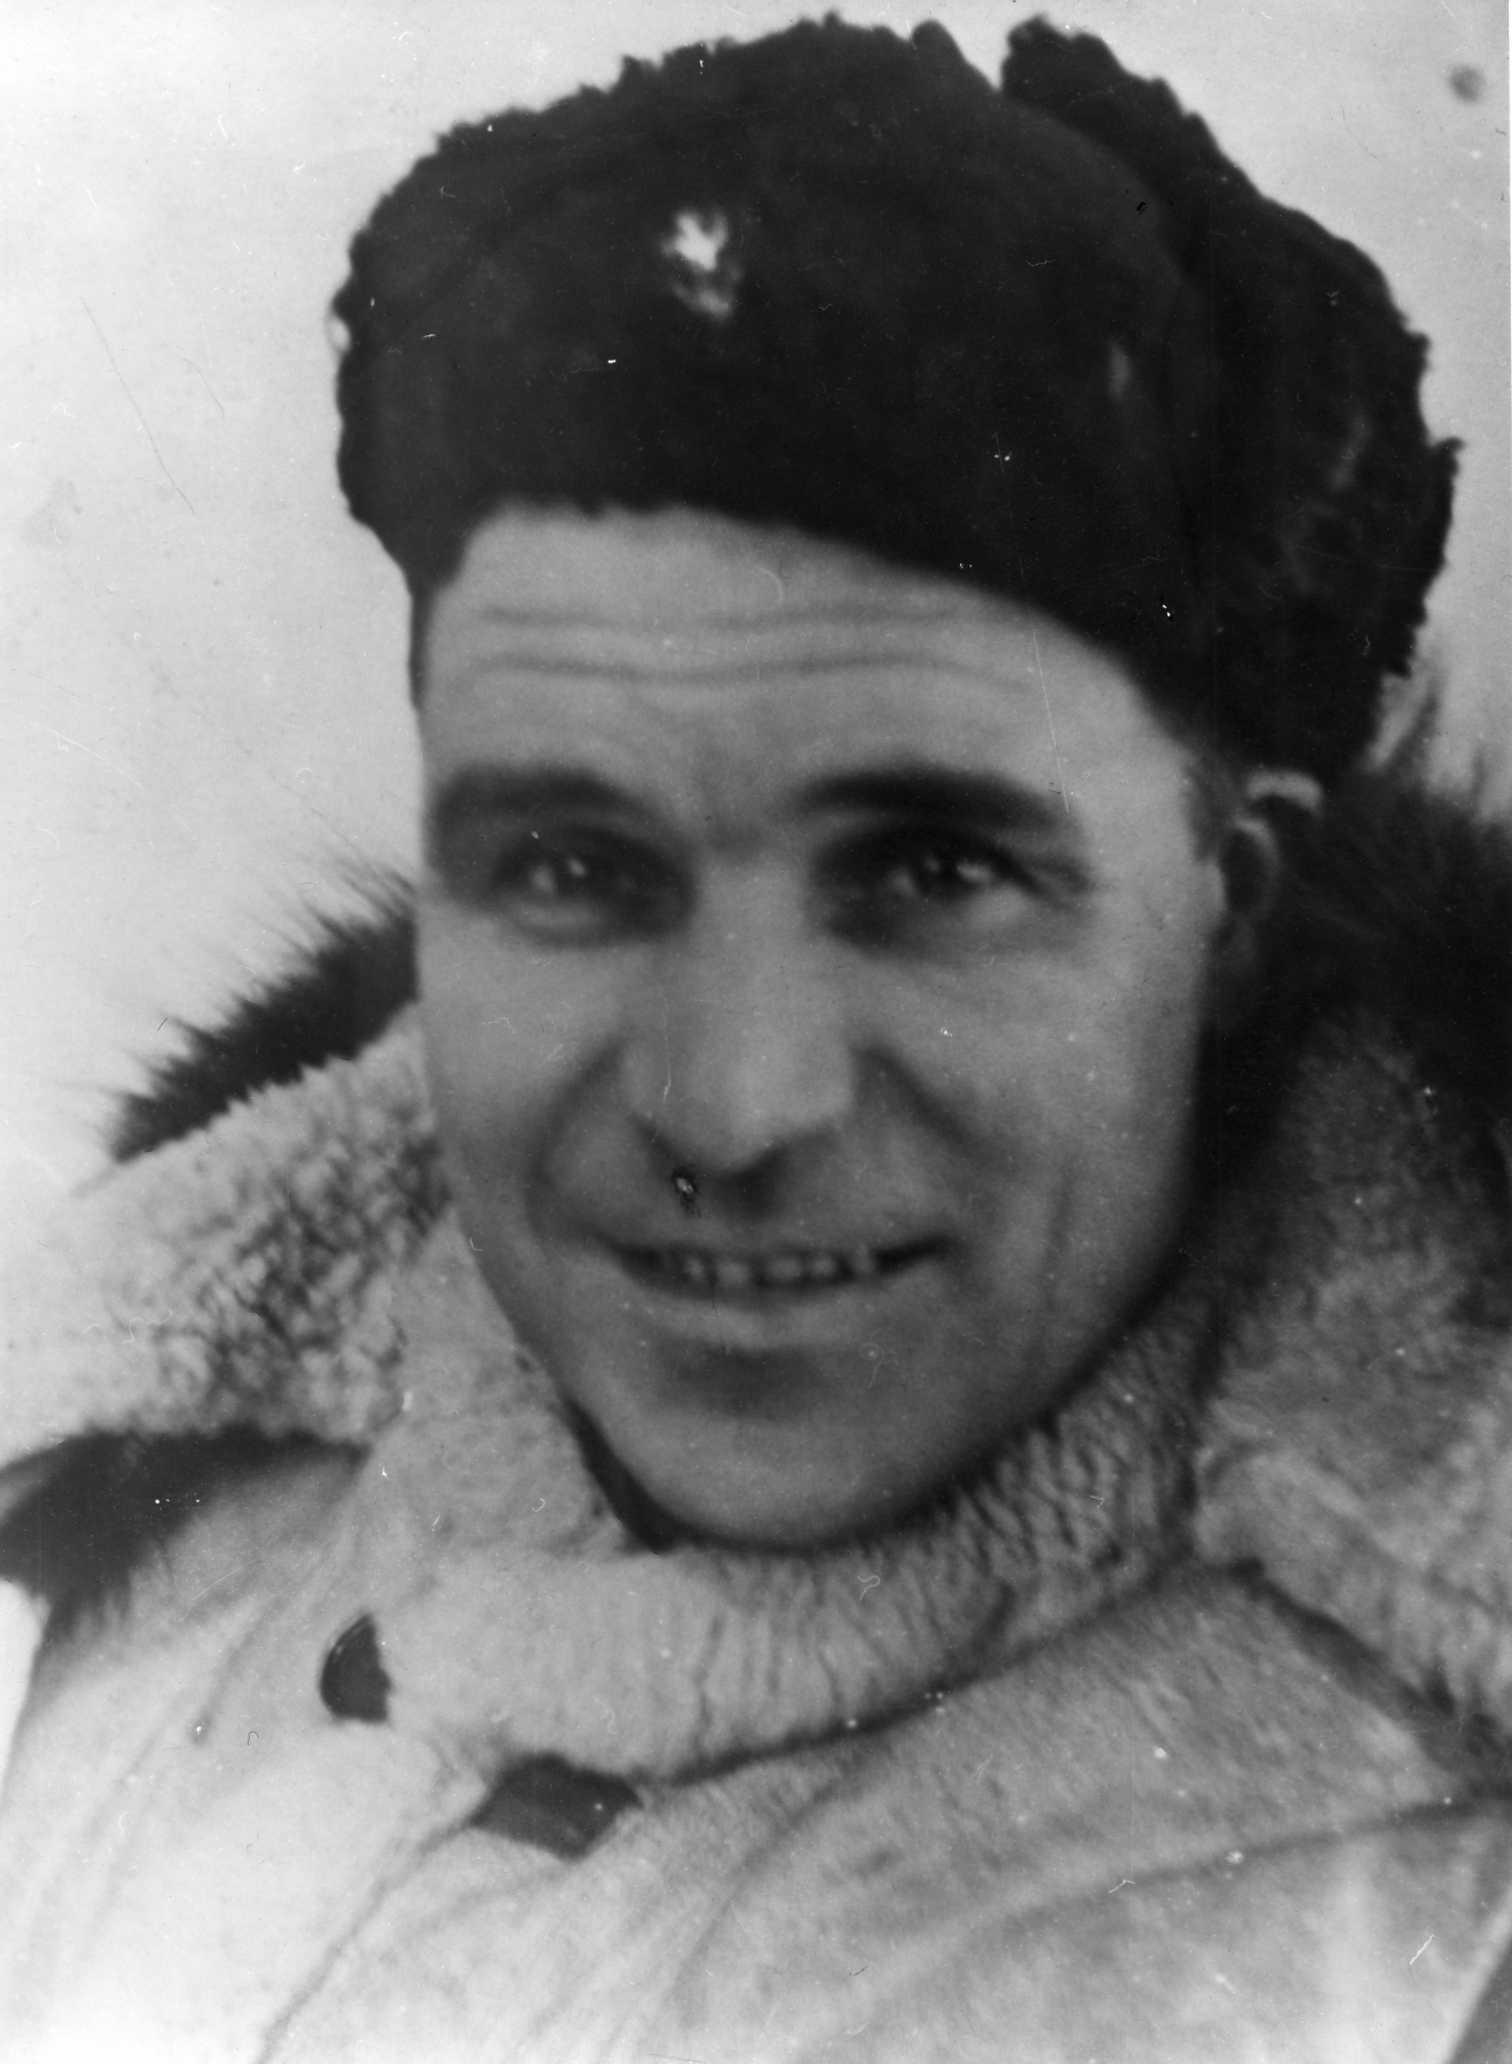 Комполка Фролов Борис Иванович